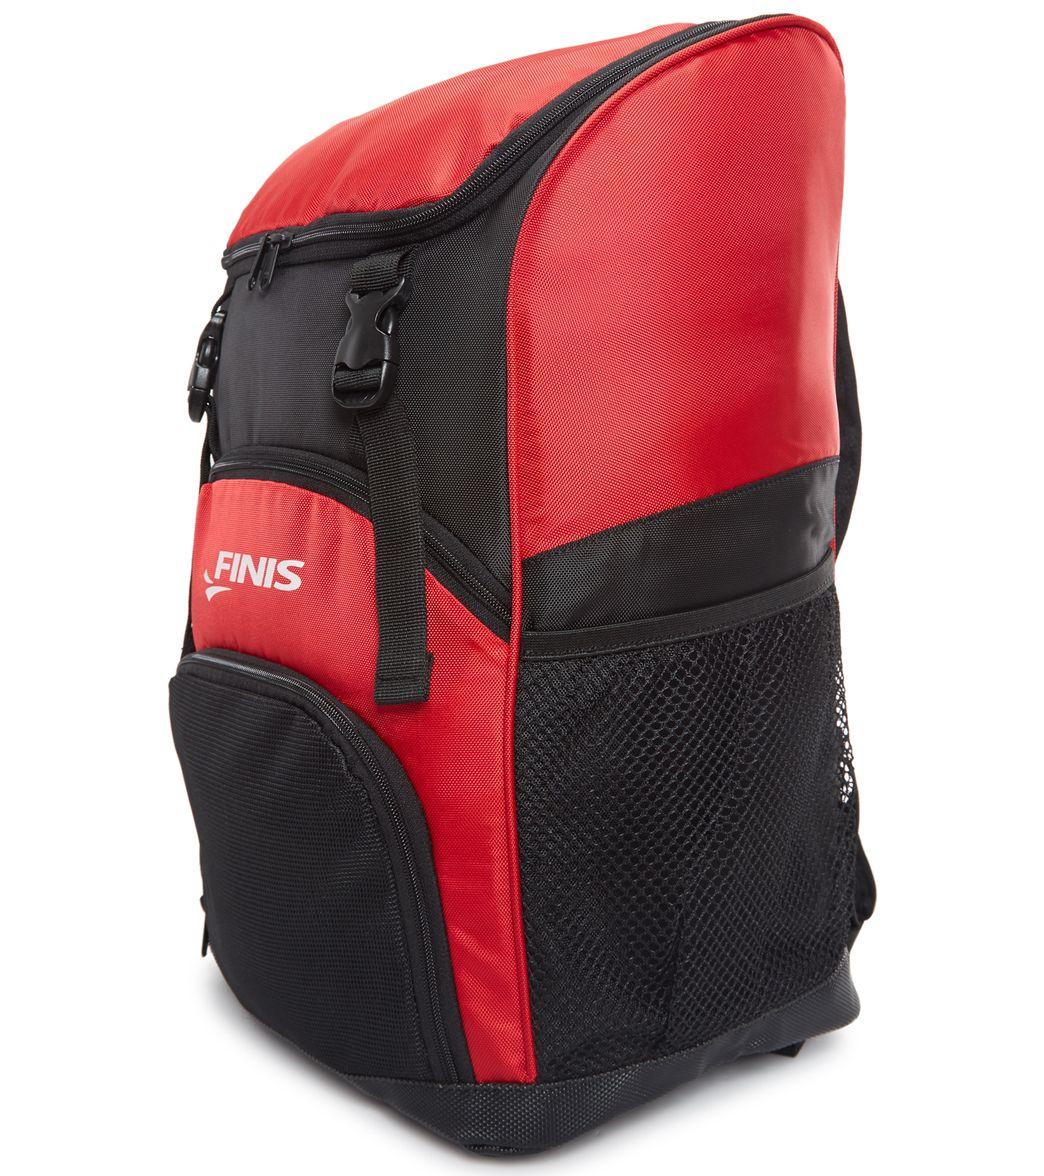 FINIS Team Swimming Bag Backpack